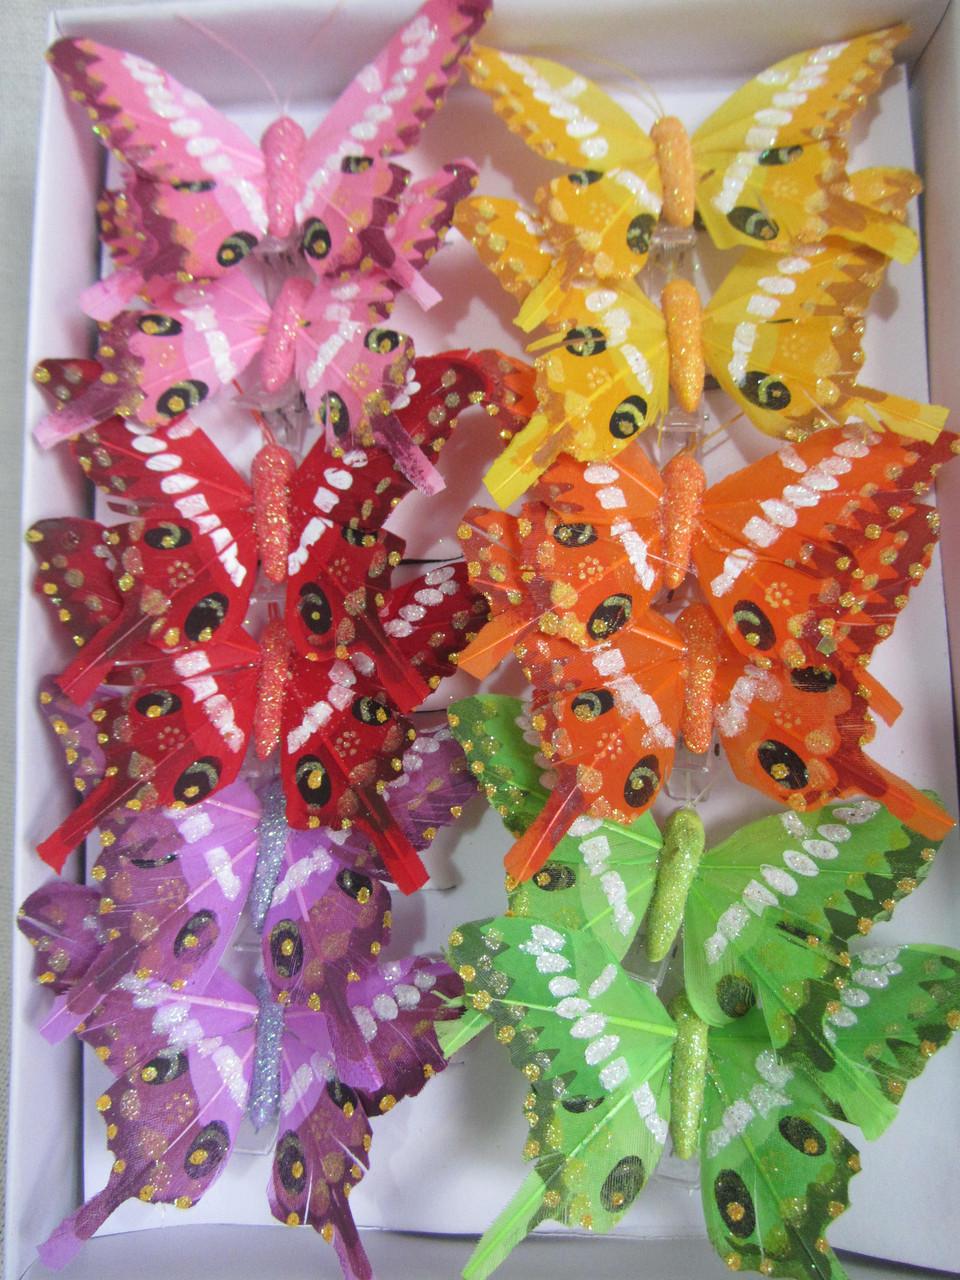 Метелики кольорові на прищепках, 12 шт\уп., 65 грн